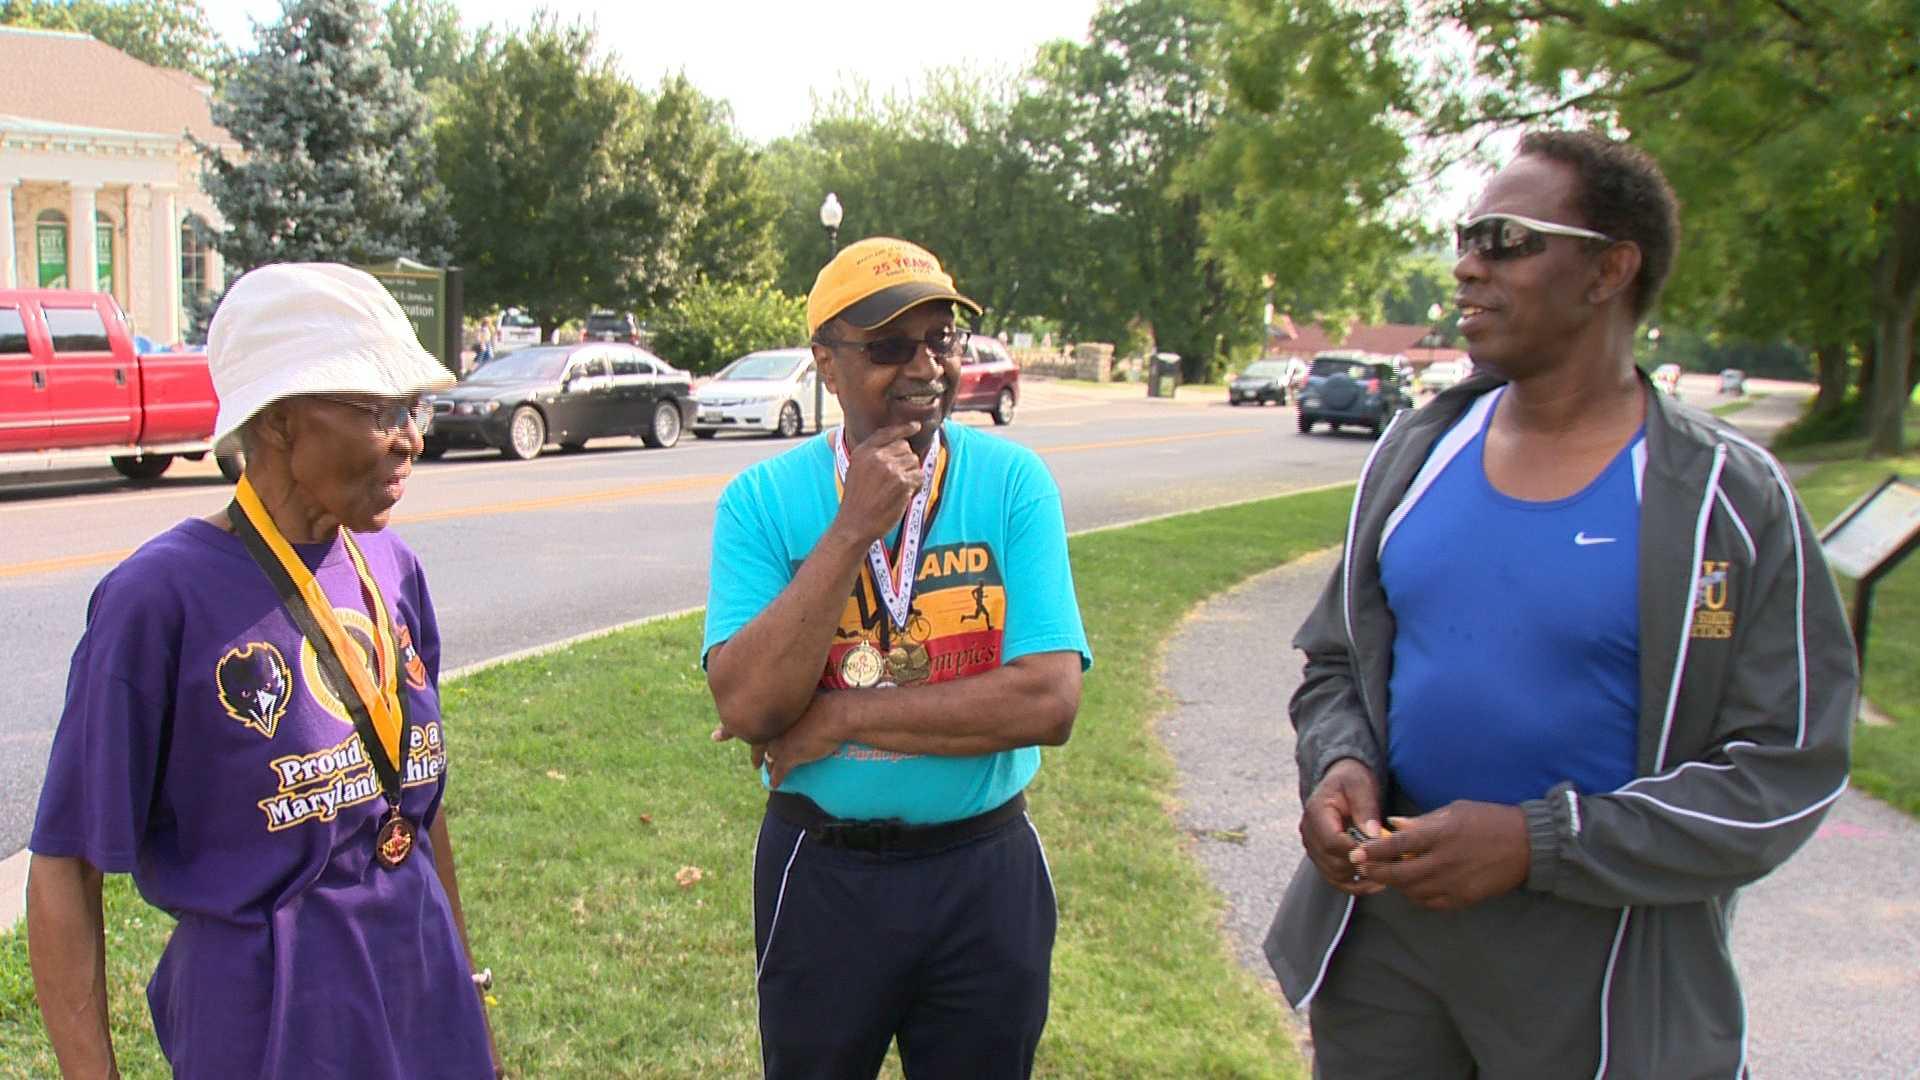 Maryland Senior Olympians